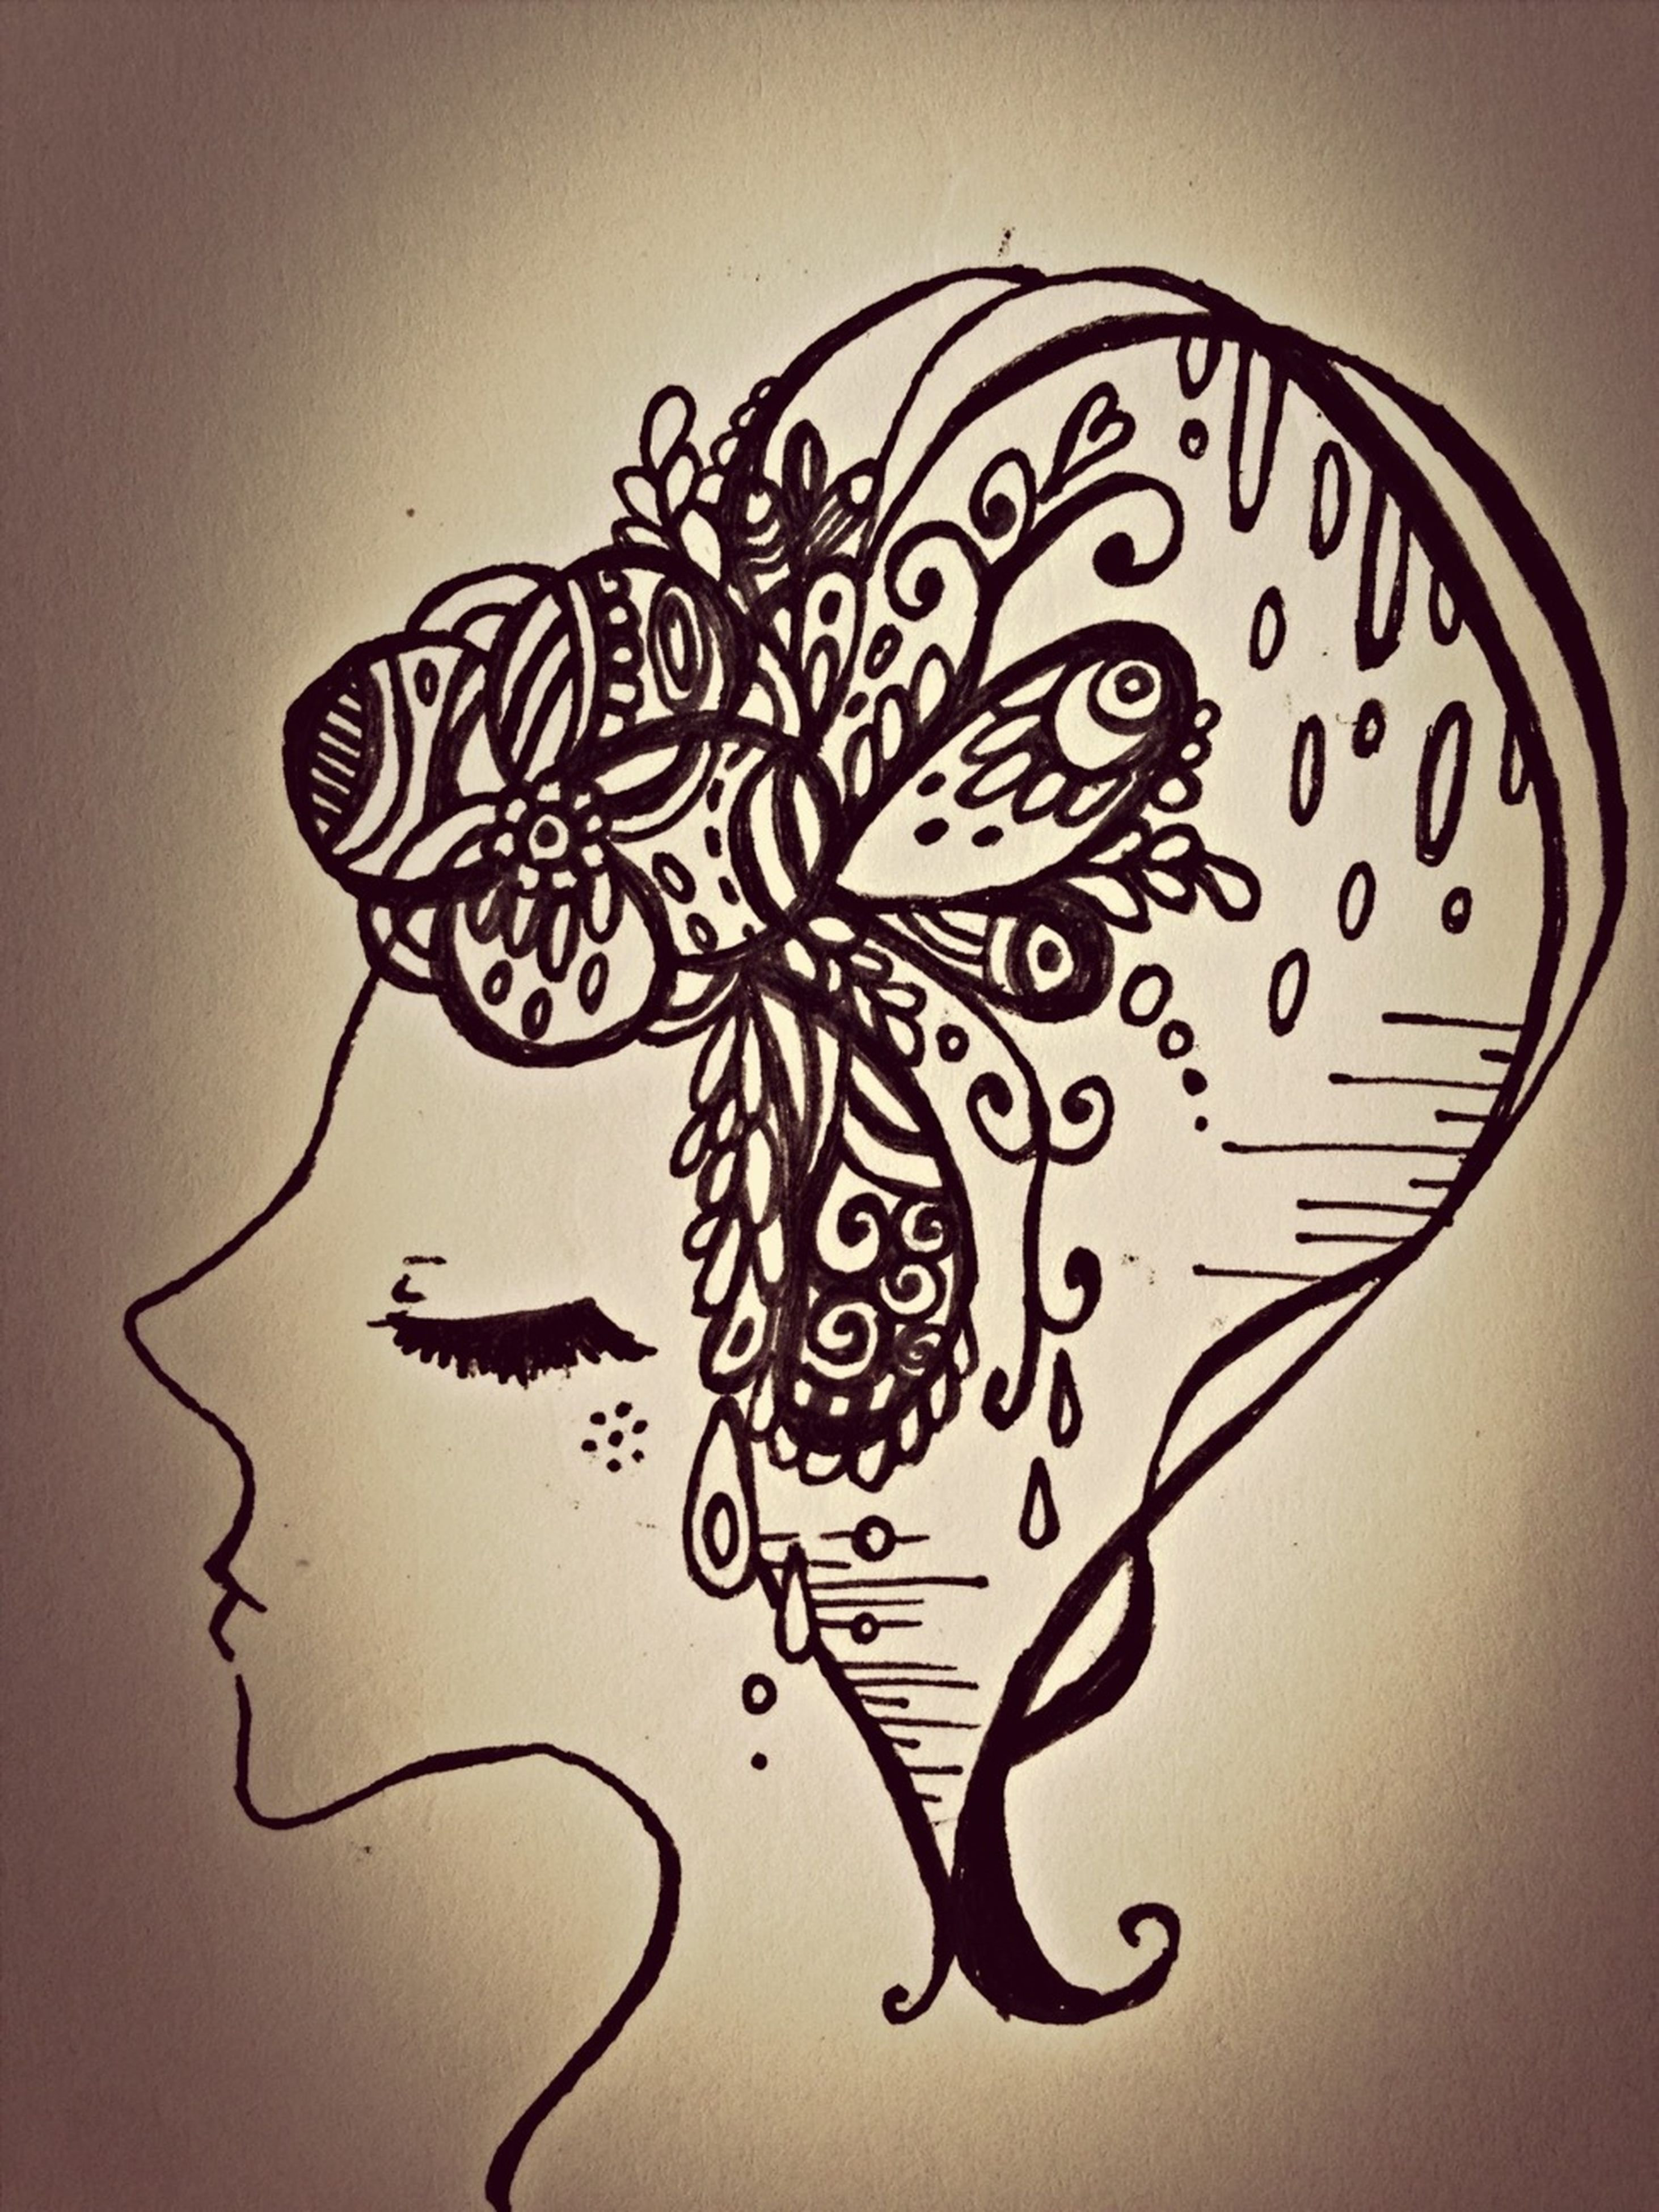 creativity, art and craft, art, indoors, design, pattern, close-up, text, studio shot, wall - building feature, ideas, heart shape, western script, communication, still life, single object, shape, no people, craft, metal